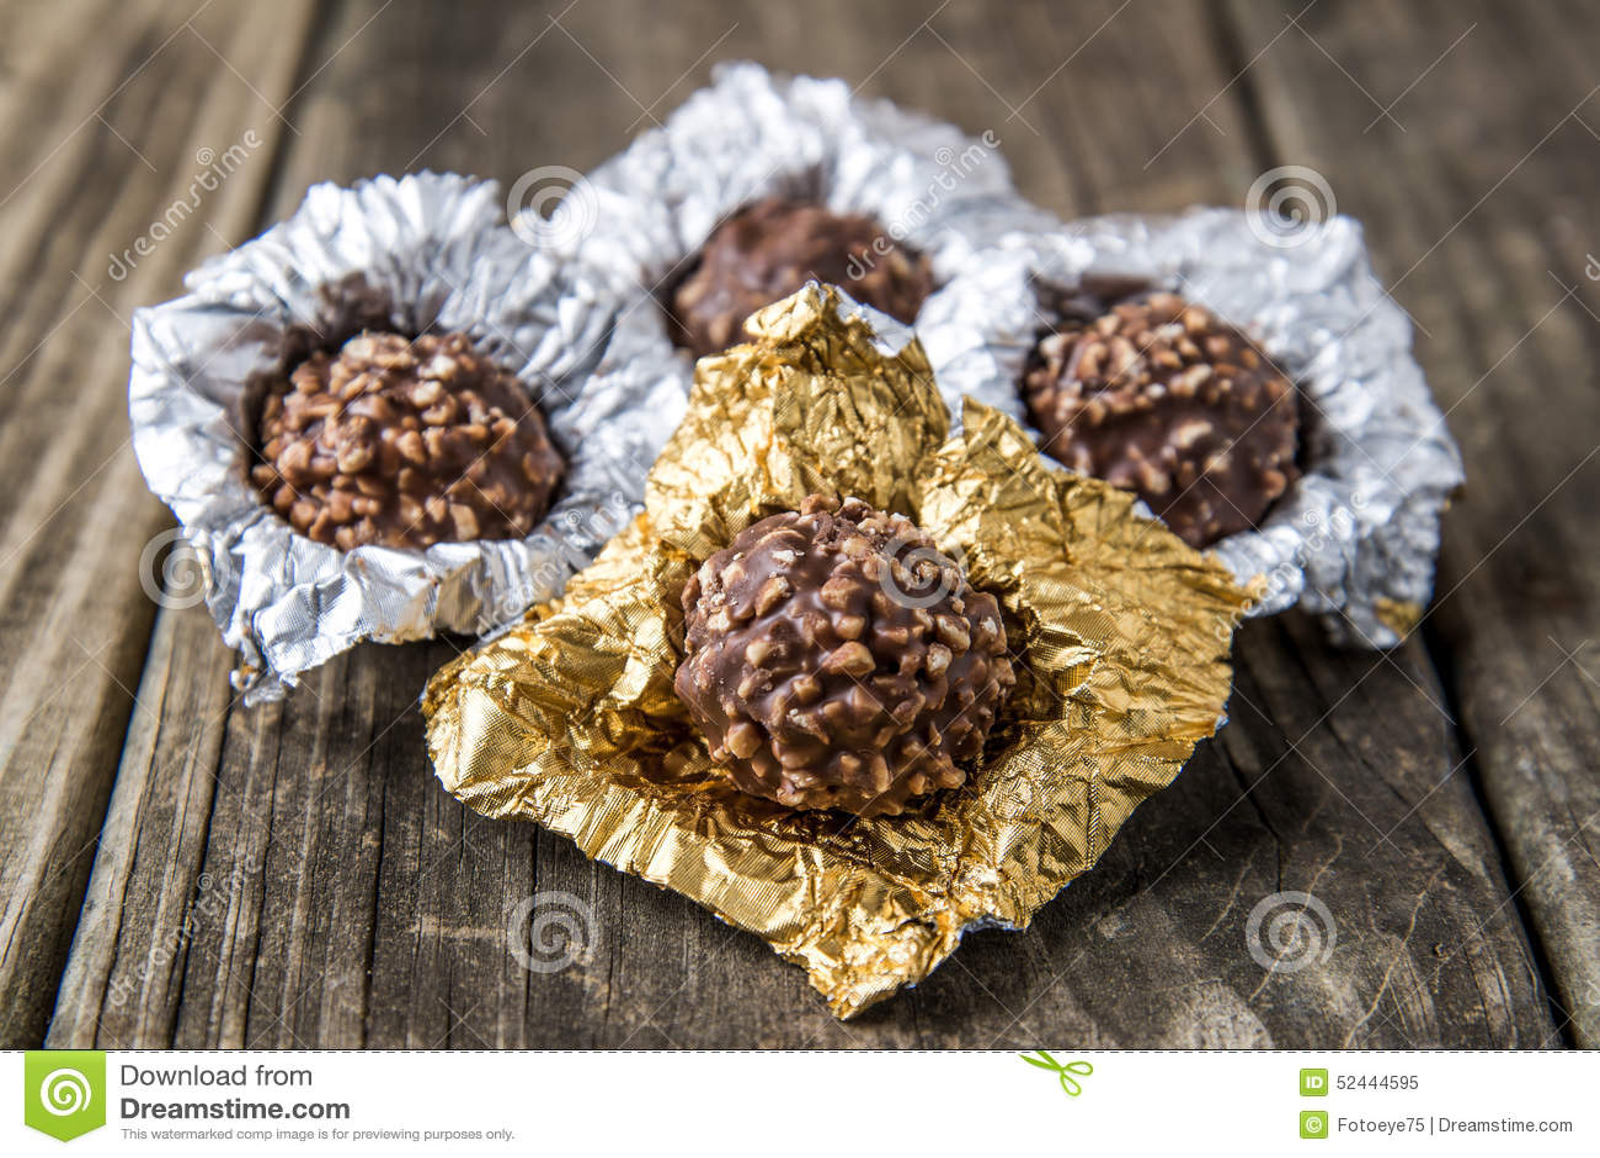 Ferrero Rocher Chocolate Hazelnut Candy In Gold Foil Stock Photo ...